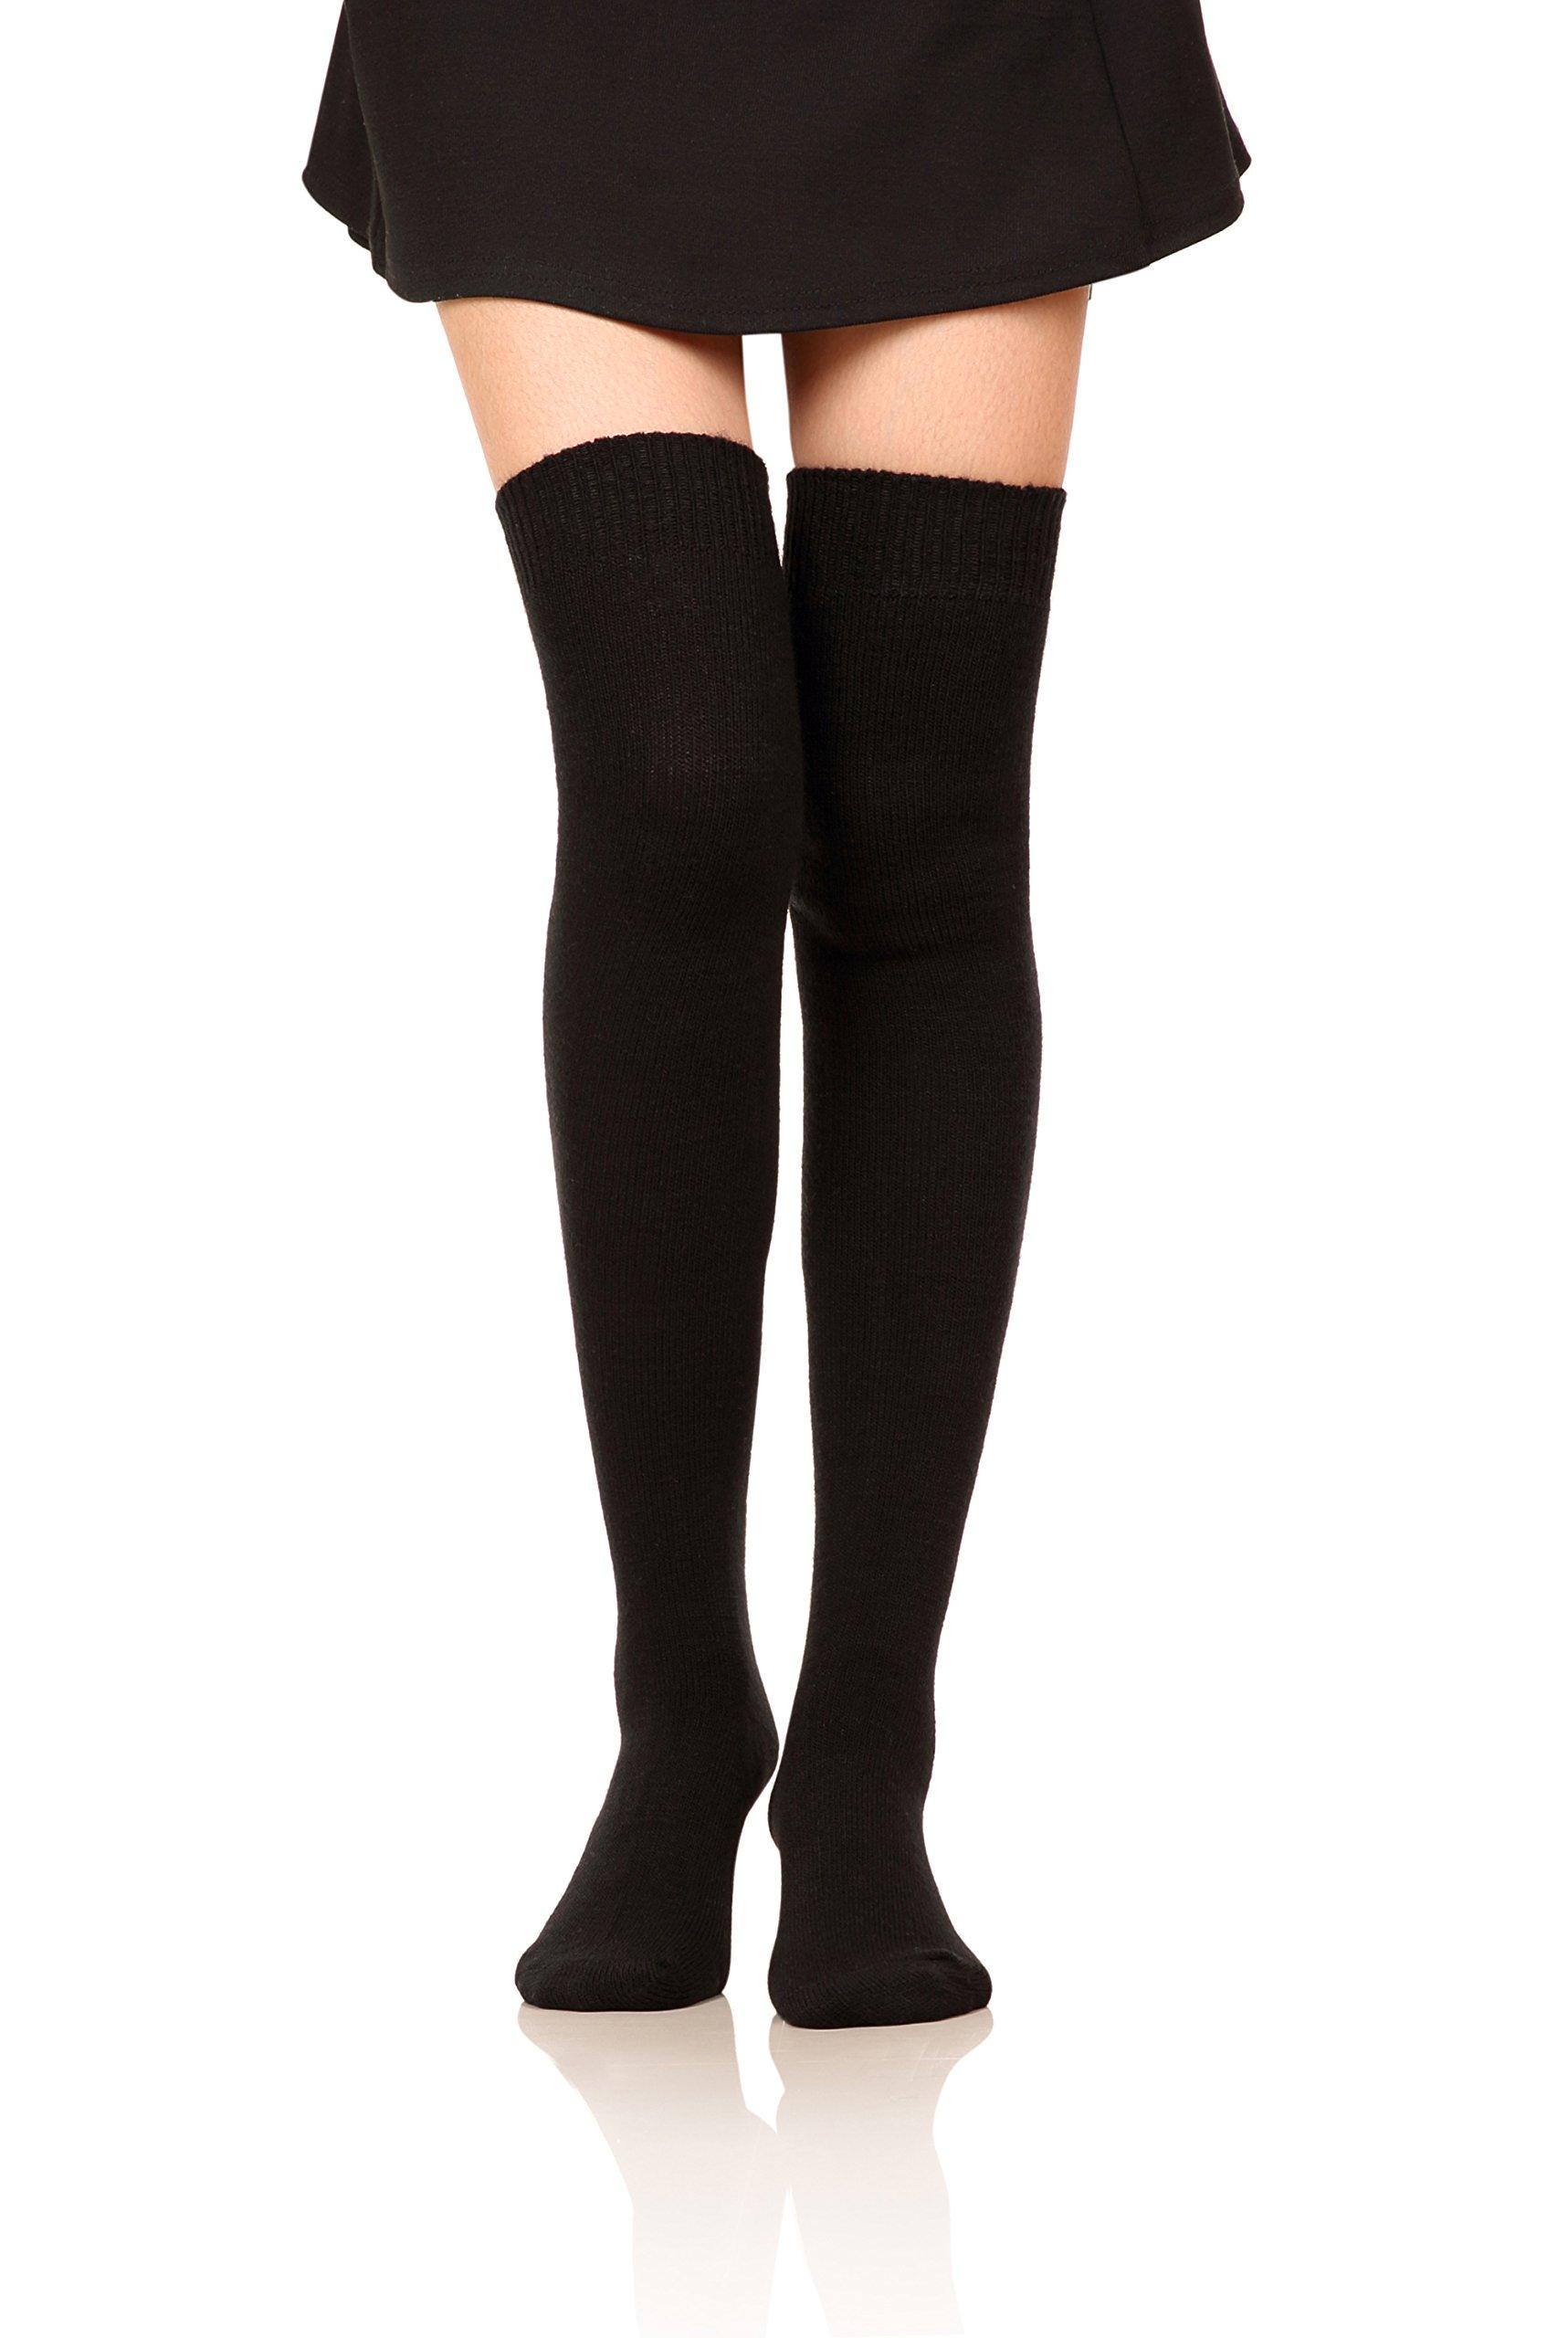 DoSmart Women Girls' Winter Warm Leggings Boot Stockings Knee High Wool Socks (Black)